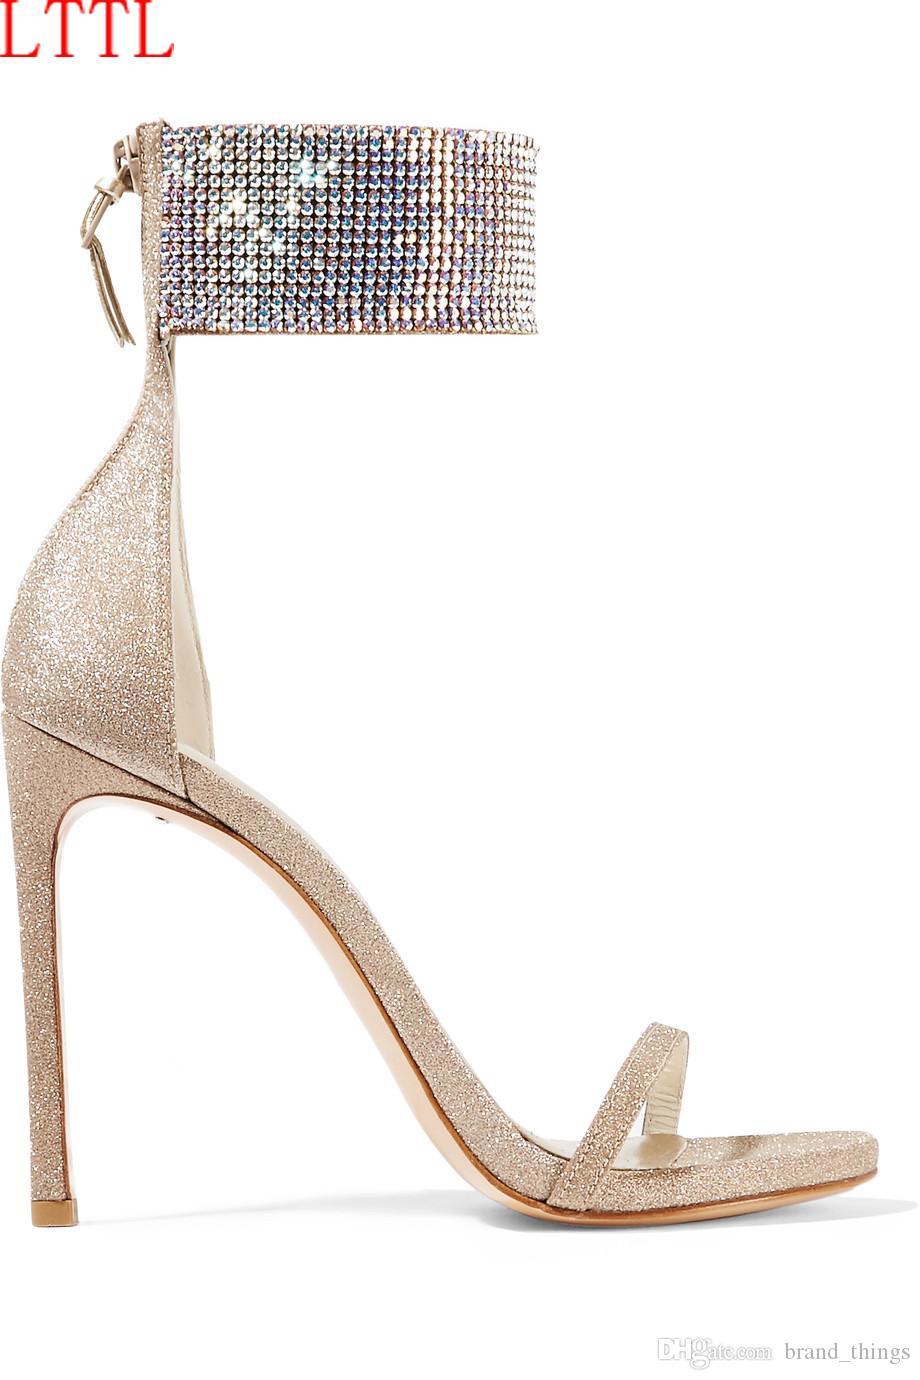 2017 neue mode strass high heels sommer gladiator sandalen offene spitze hochzeit schuhe dünne ferse glitter pailletten goldene sandale